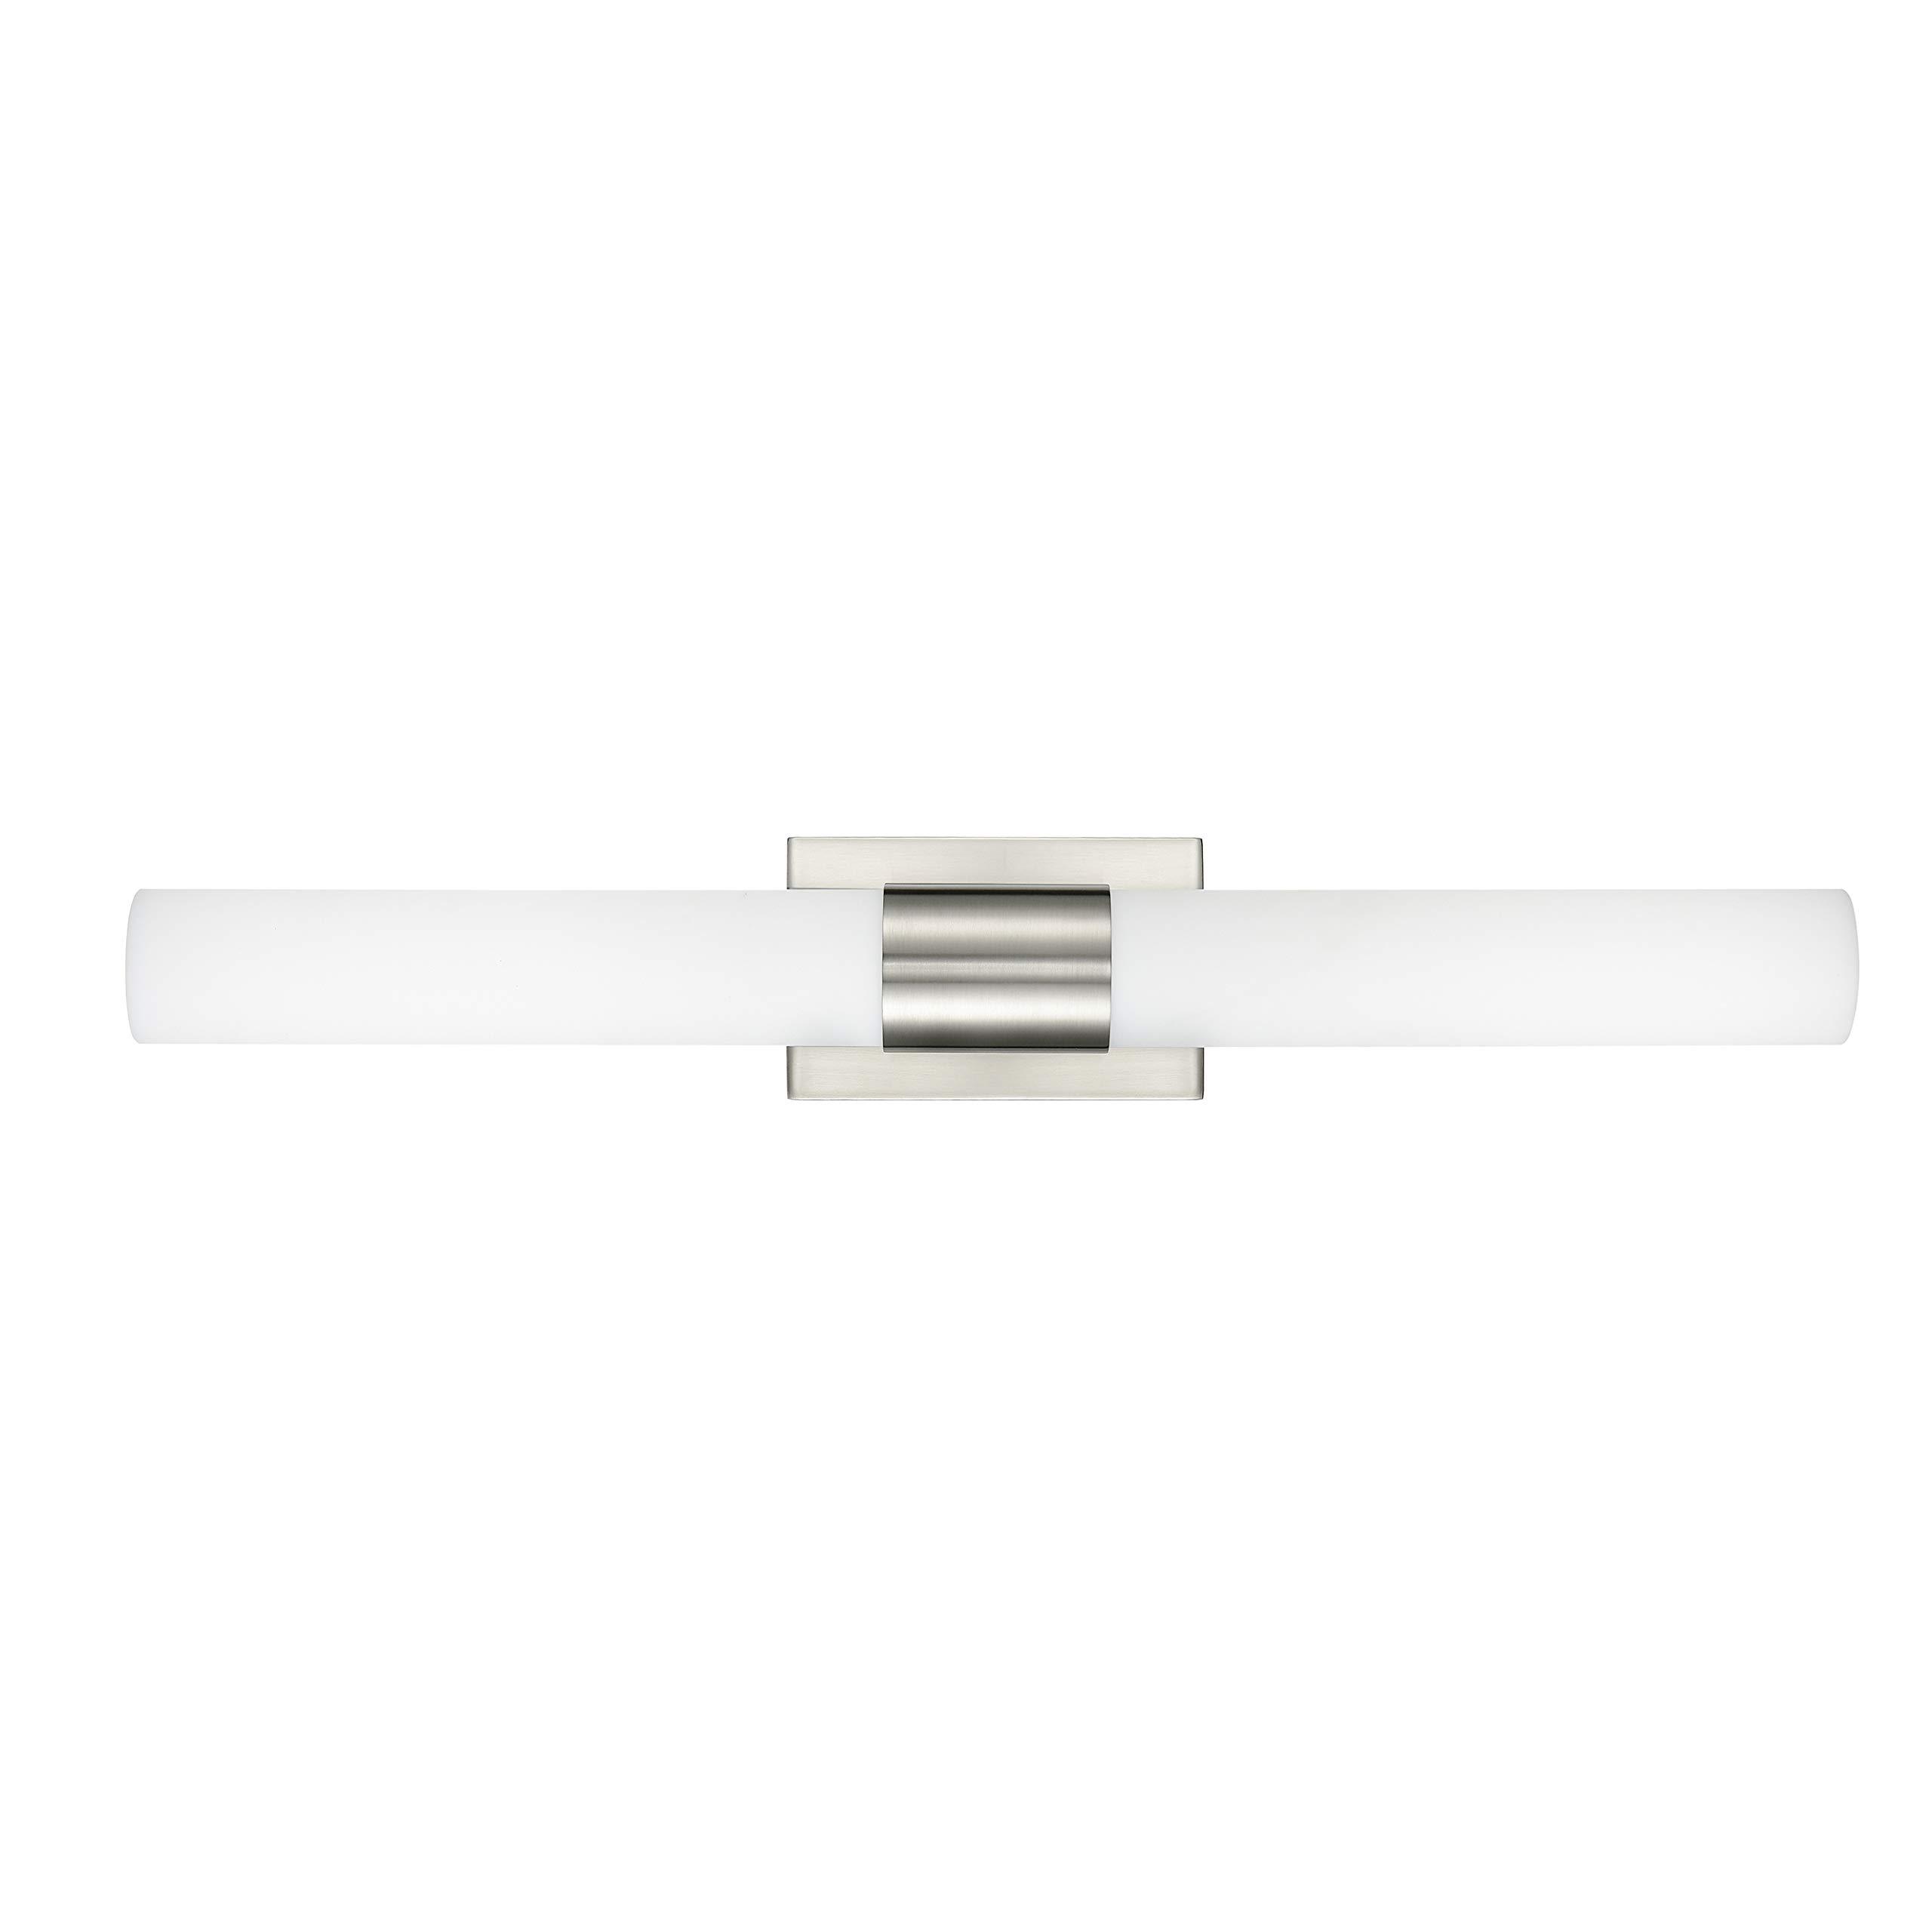 Perpetua 30 inch Integrated LED Bathroom Vanity Lights | Brushed Nickel Bathroom Light LL-SC1043-BN by Linea di Liara (Image #7)